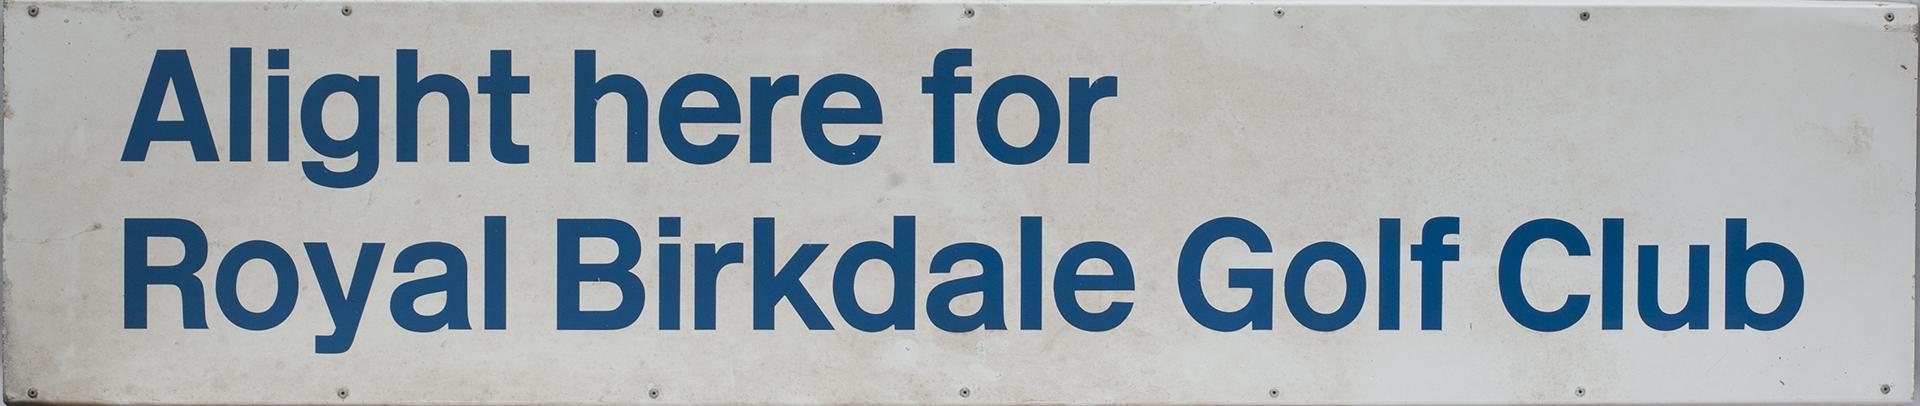 BR Station Sign ALIGHT HERE FOR ROYAL BIRKDALE